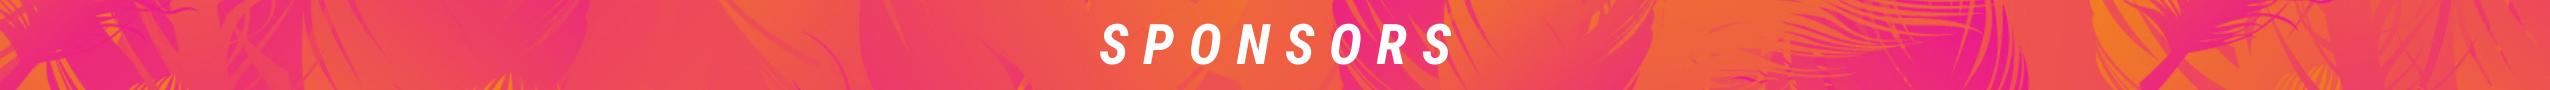 2021 Gala Website Banners (2)